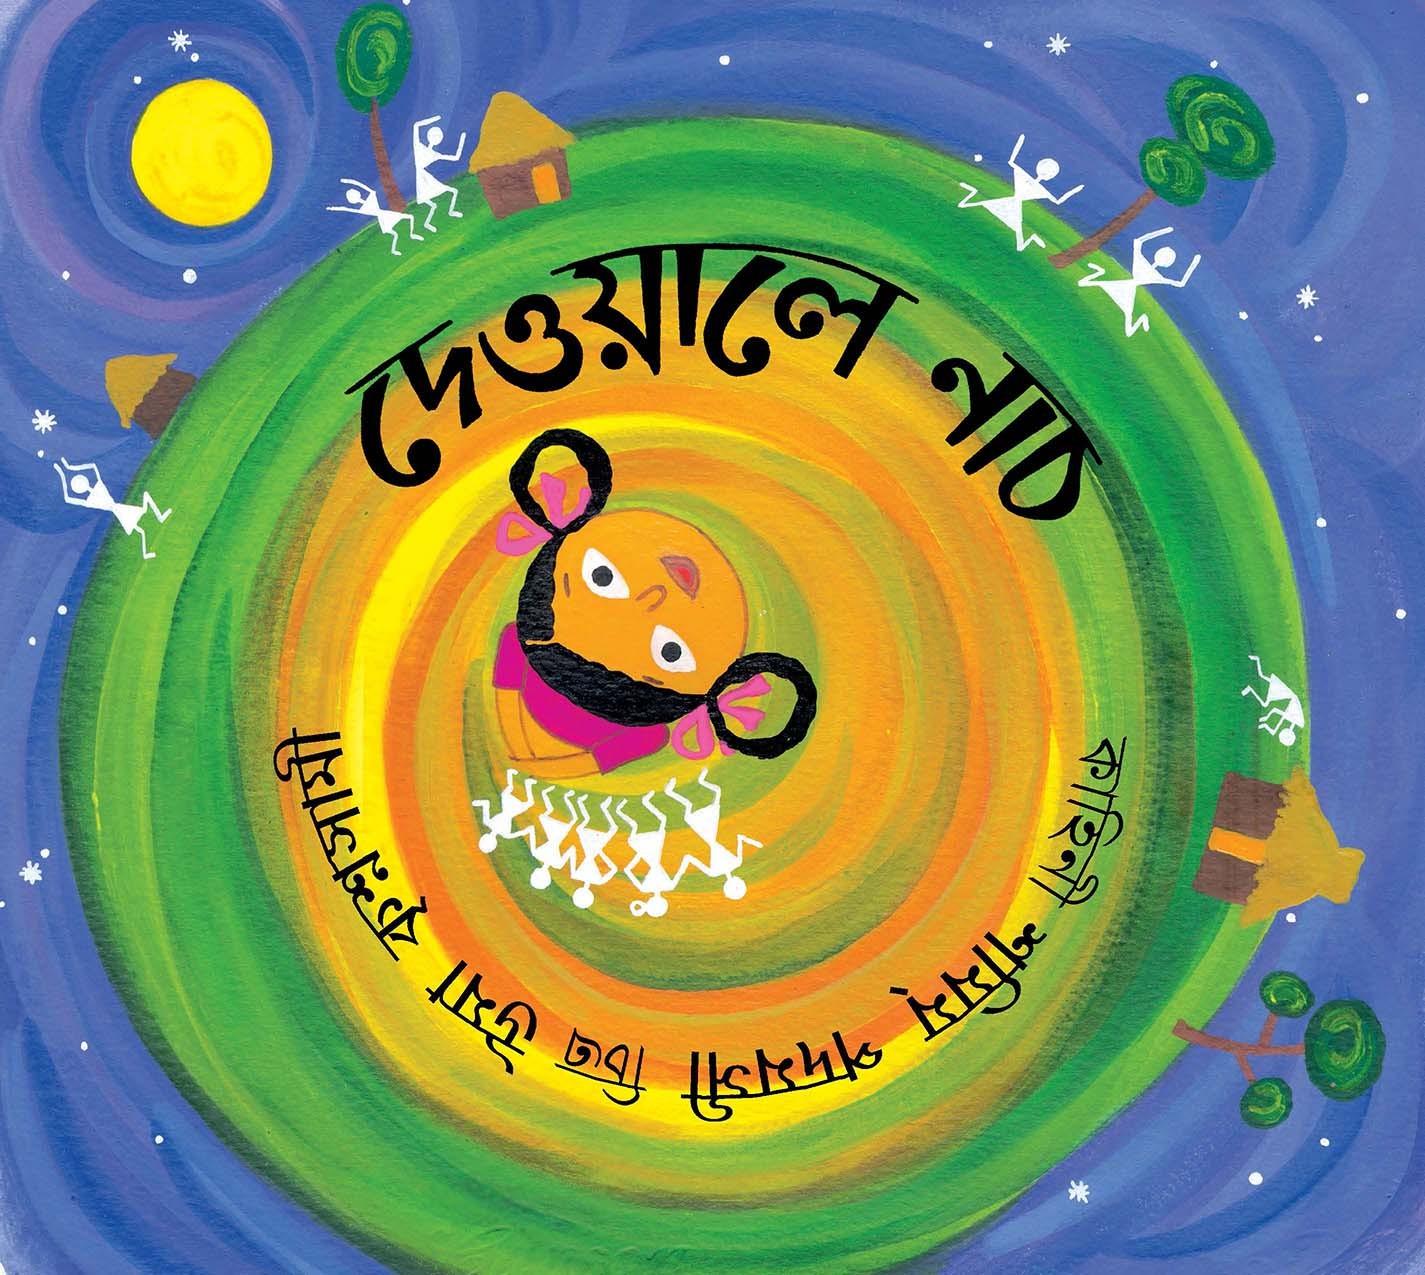 Dancing On Walls/Dewaley Naach (Bengali)